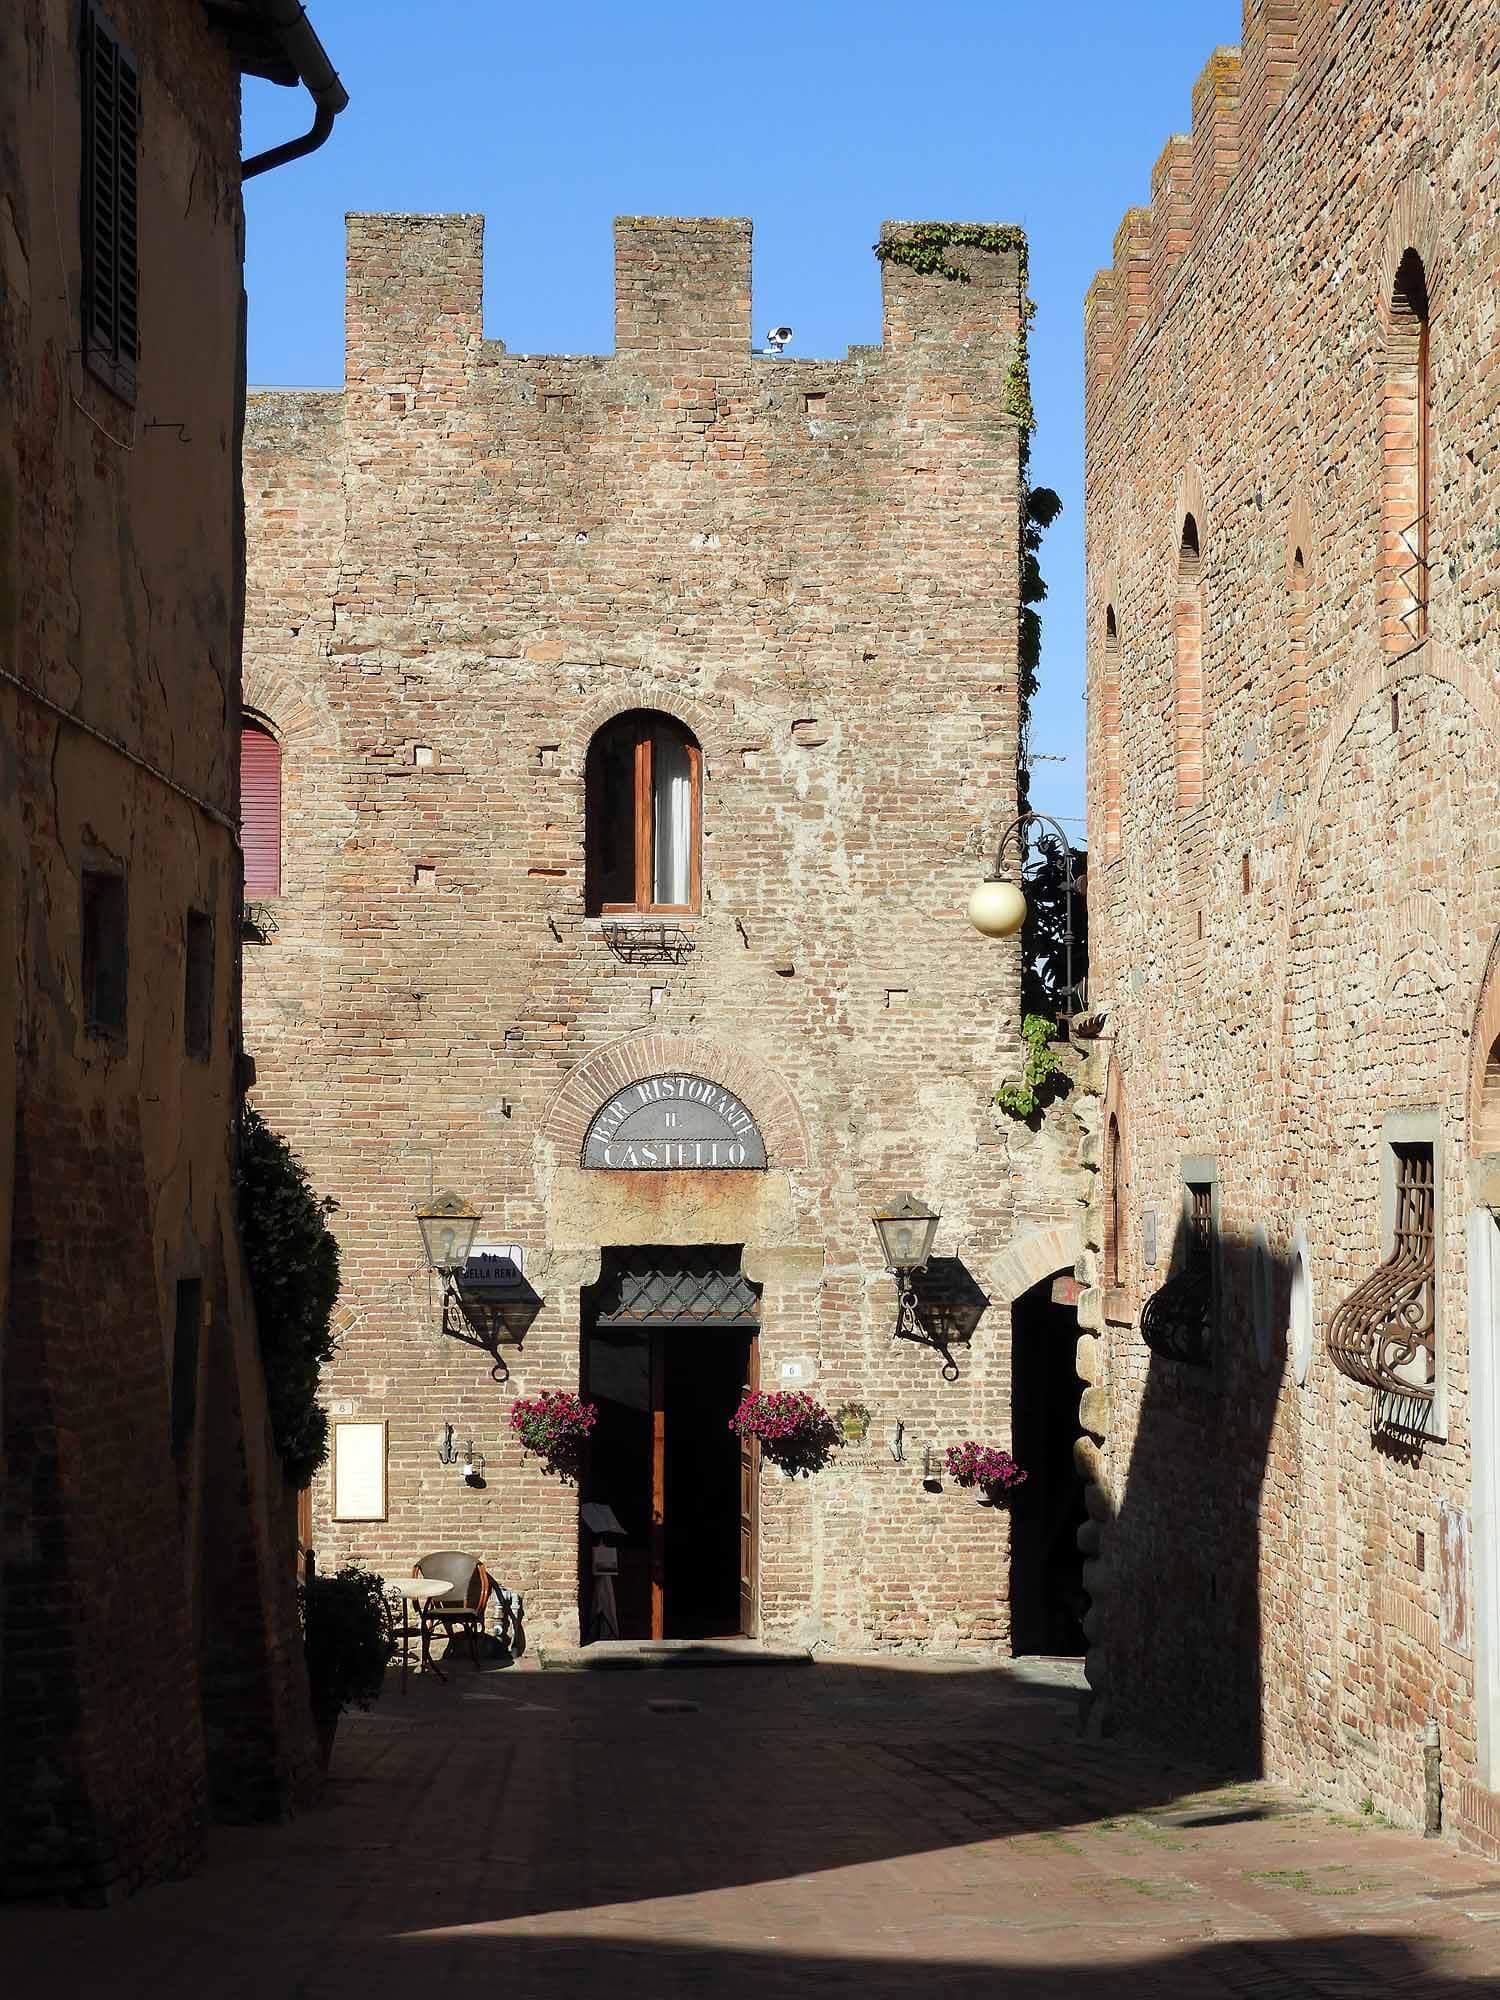 italy-italia-certaldo-old-tuscany-stone-antique-vintage.JPG